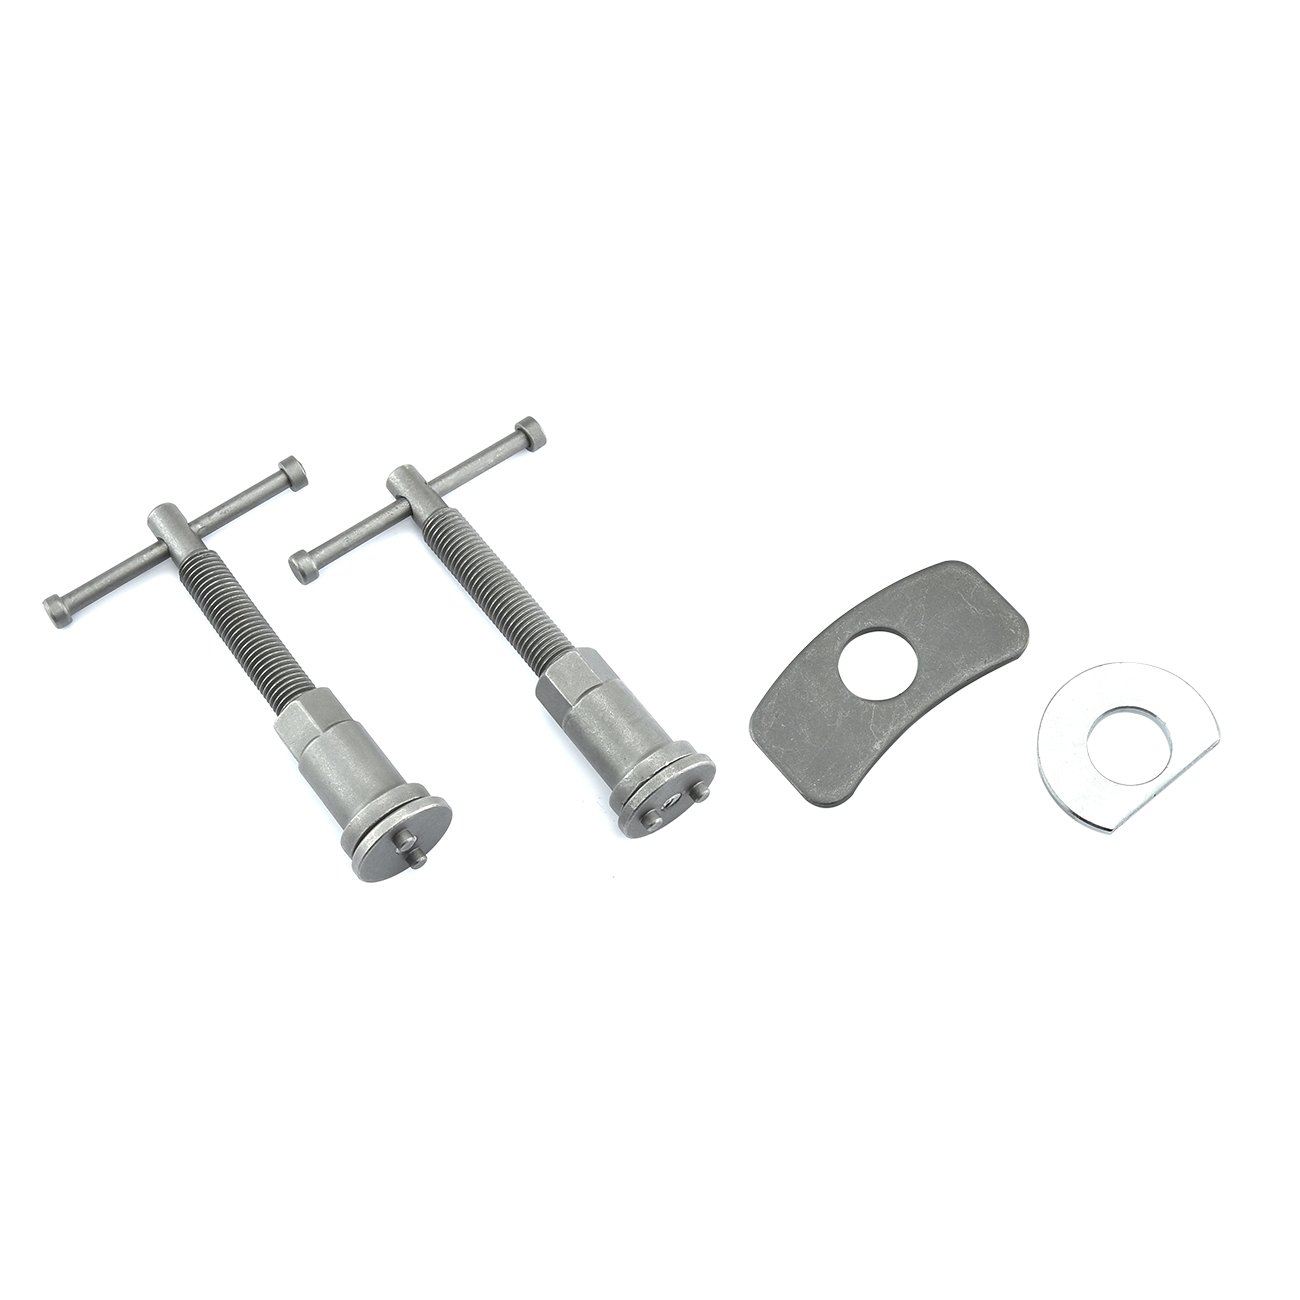 21 Piece Tool Kit Car/Truck Disc Brake Caliper Rewind Wind Back Auto Tool Set Kit for Piston Pad Disc Brake Car Truck Mechanics by Voluker (Image #5)